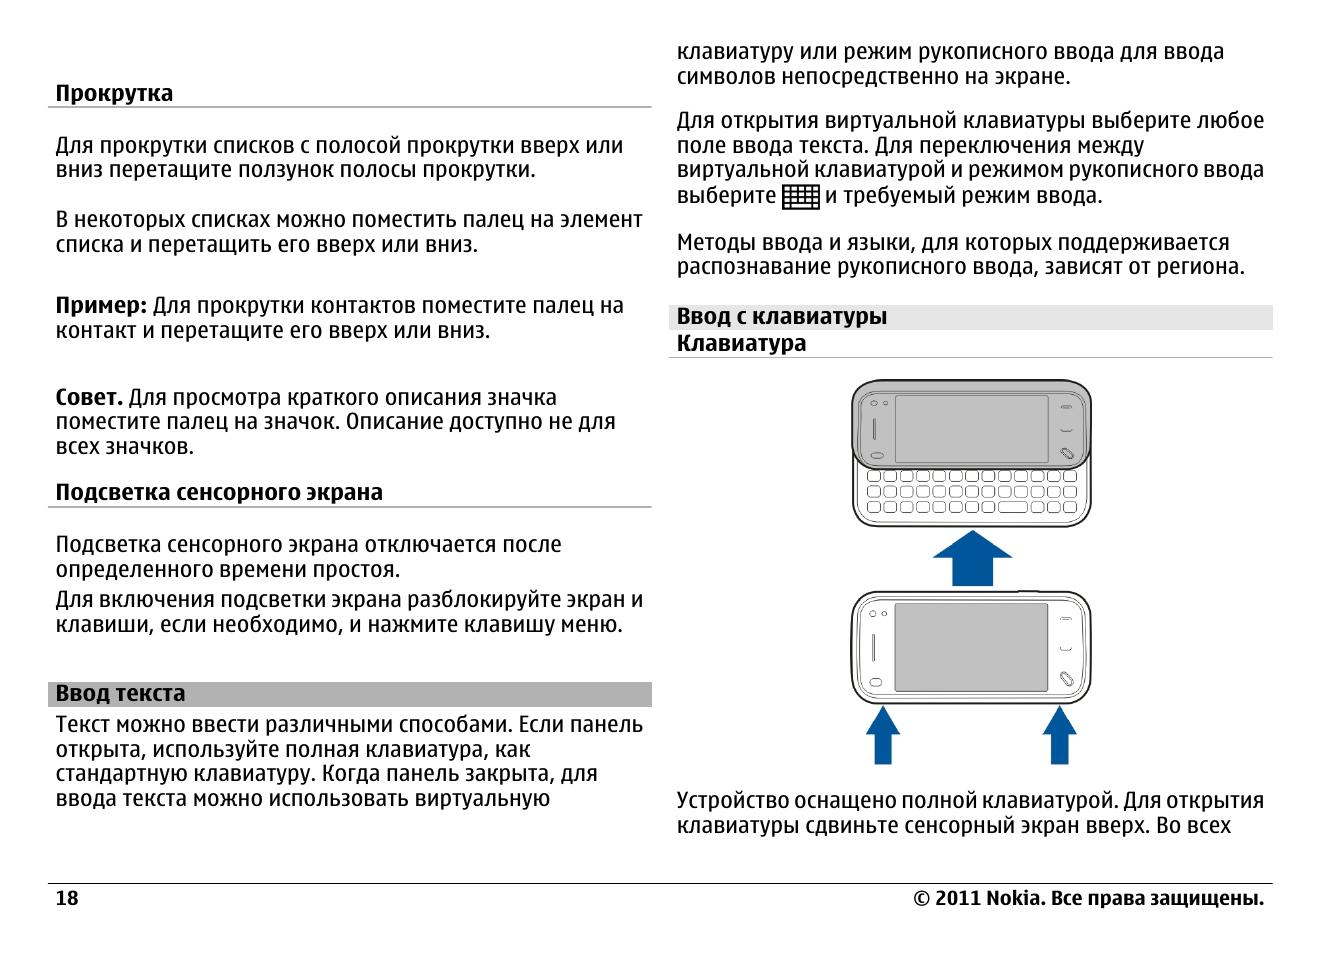 Ввод текста, Ввод с клавиатуры, Клавиатура Инструкция по эксплуатации Nokia N97mini Страница 18 / 151